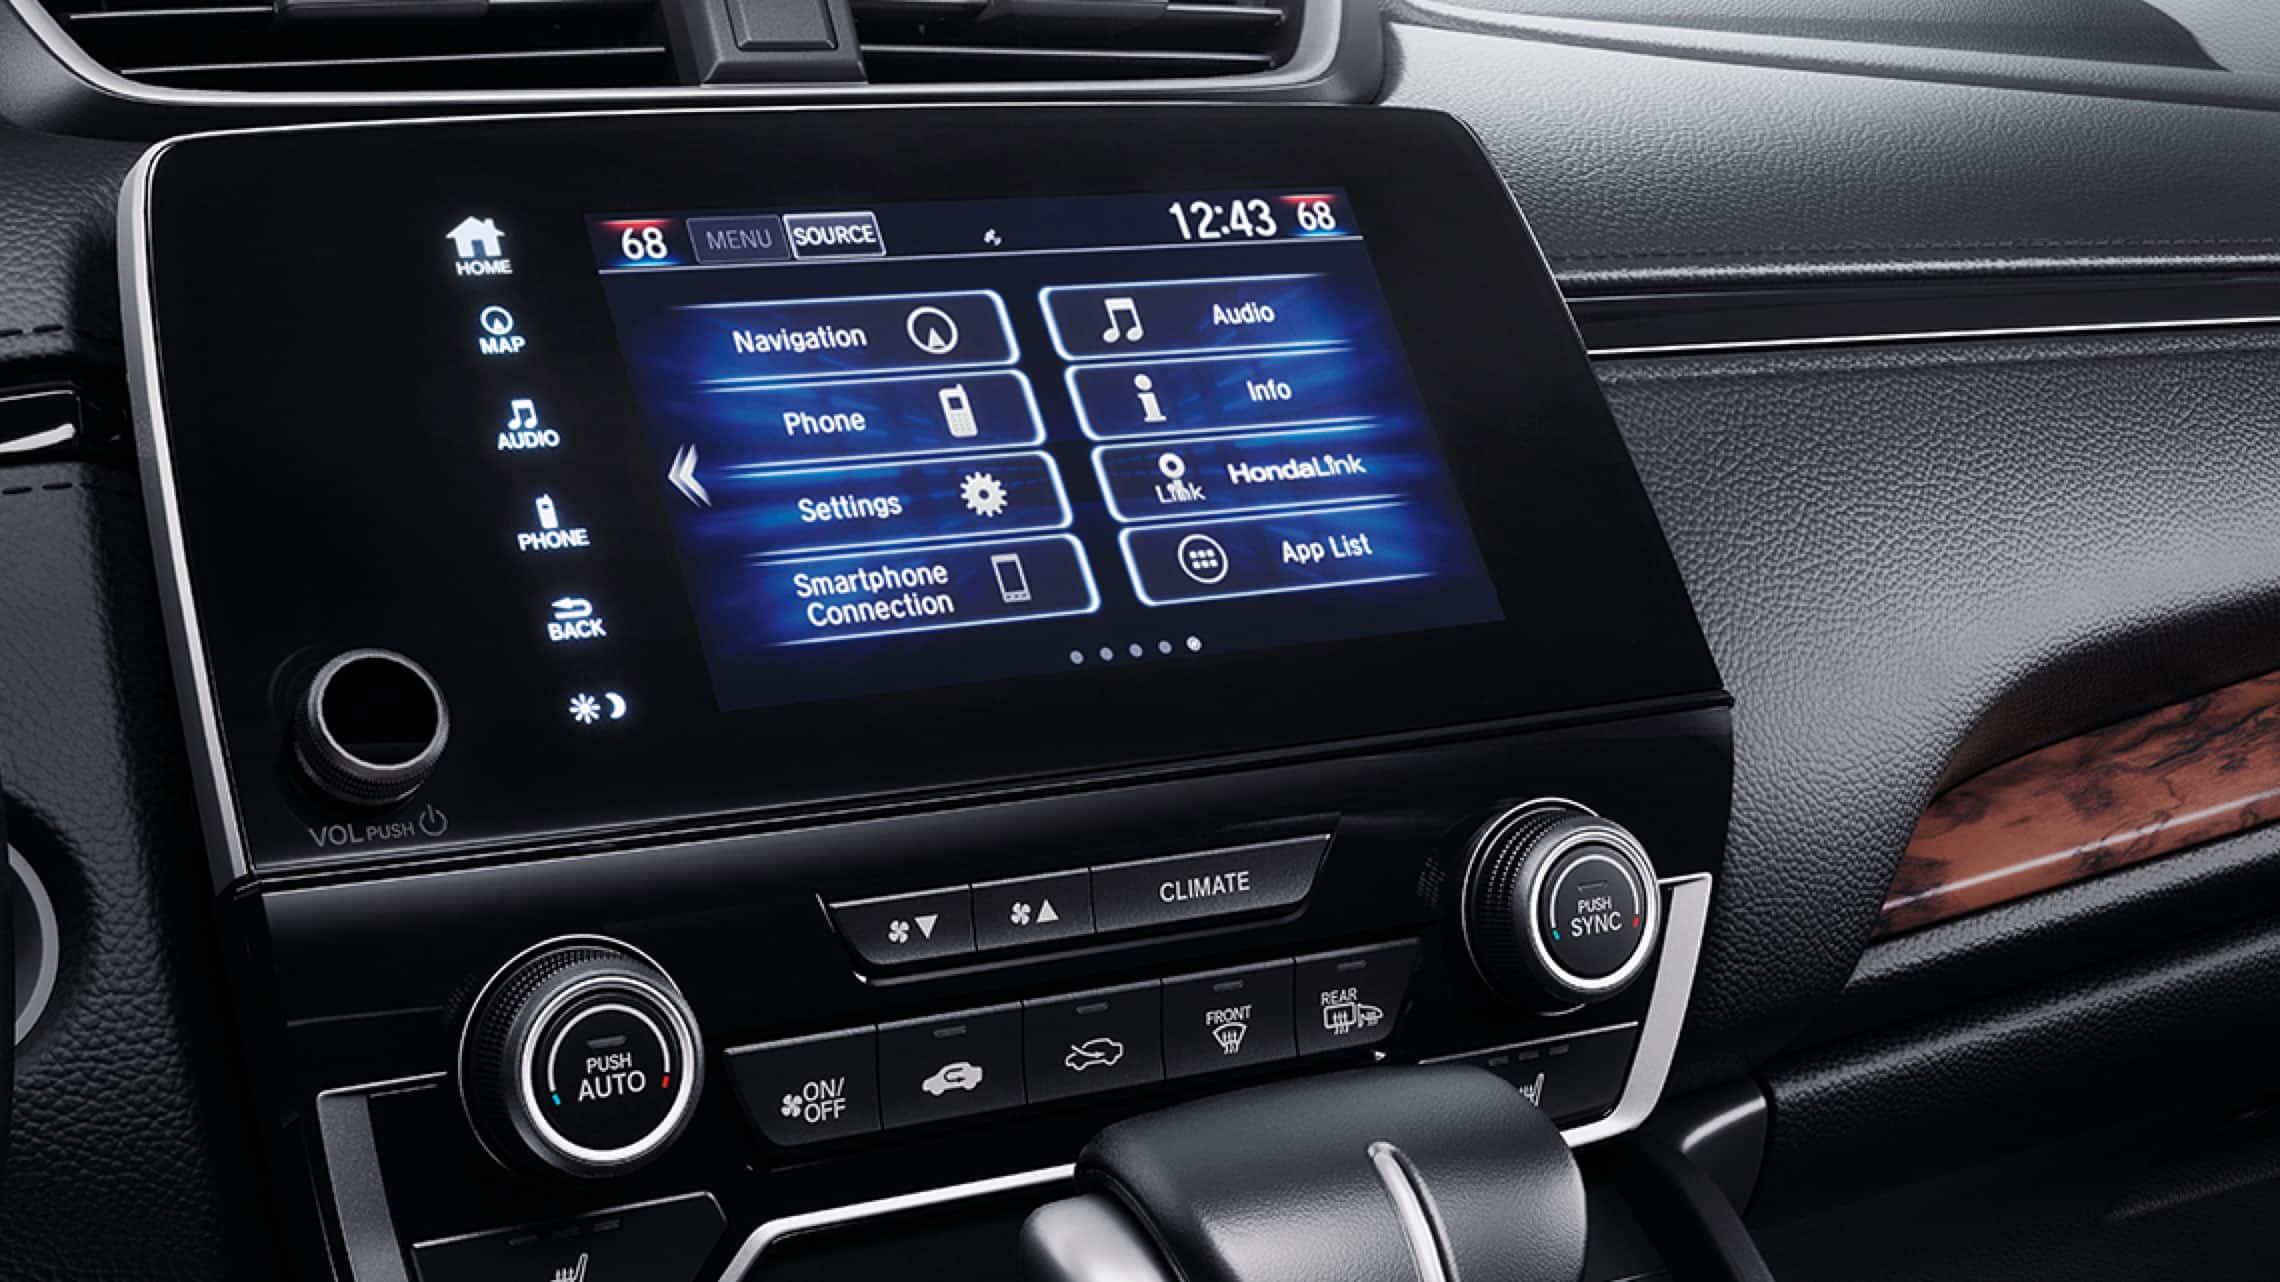 Sistema de audio en pantalla táctil de 7pulgadas en la Honda CR-V2019.